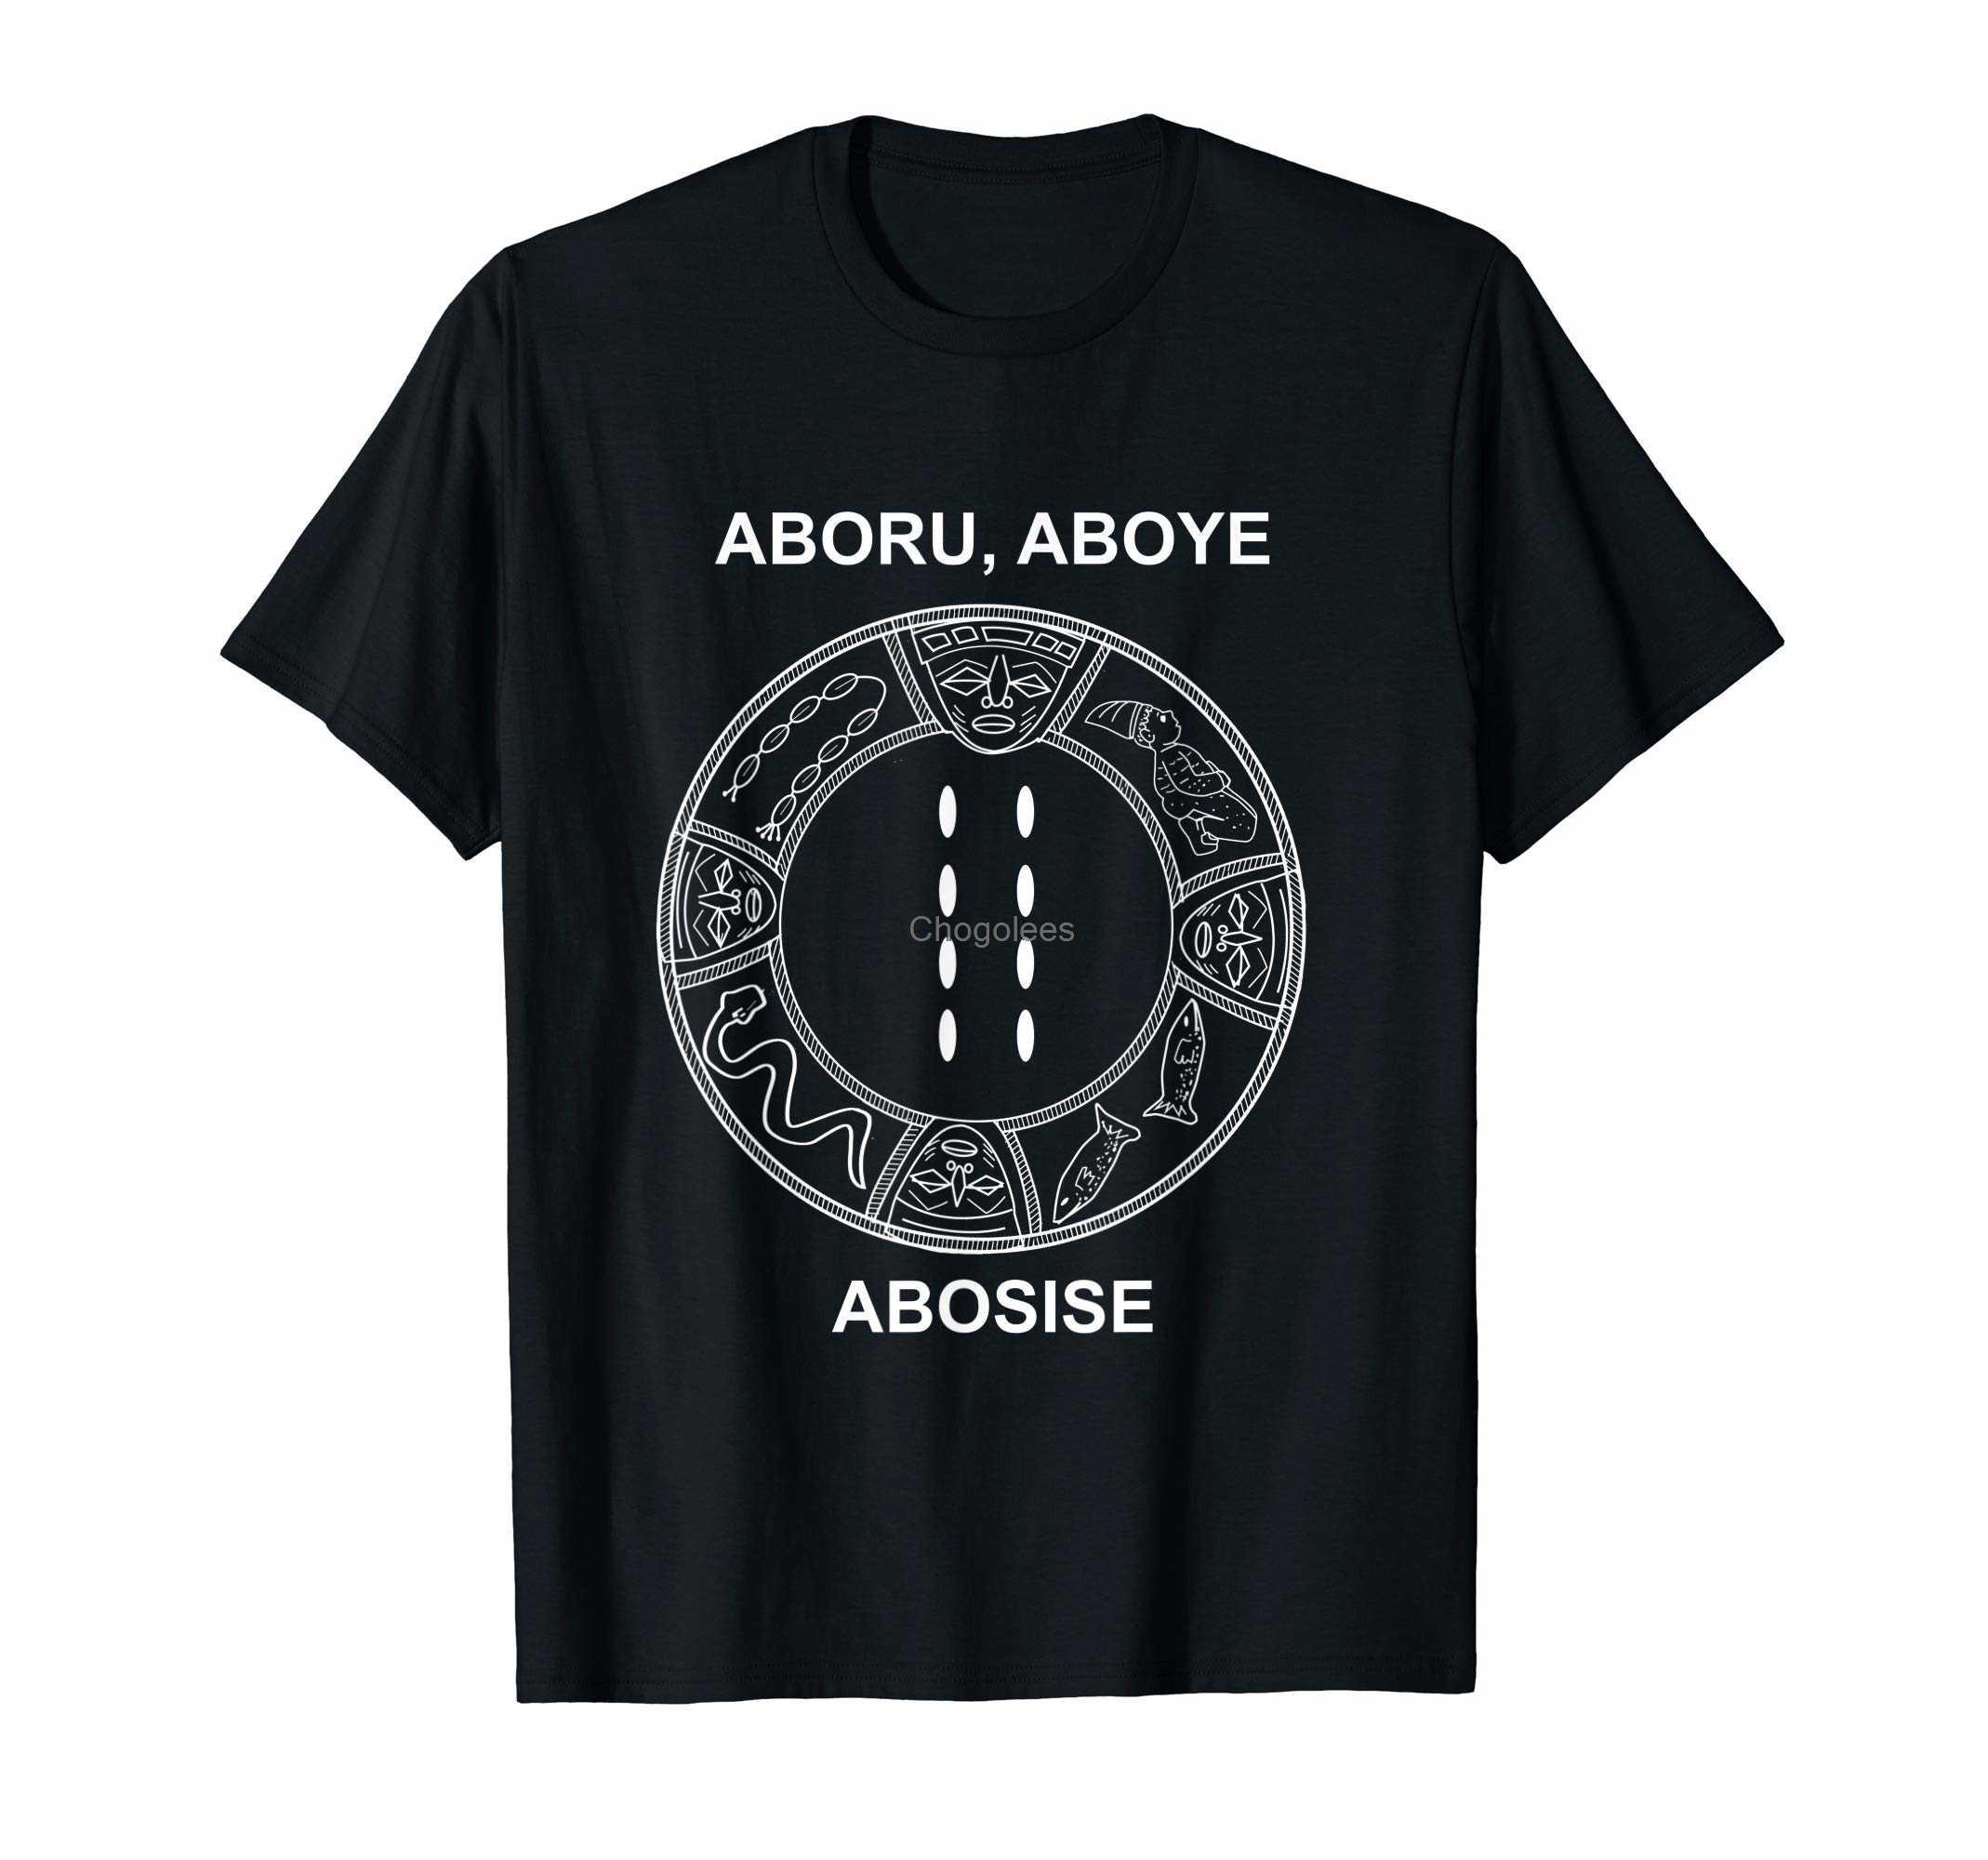 Темная футболка Eji Ogbe Aboru Aboye Abosise Ifa и Orisha